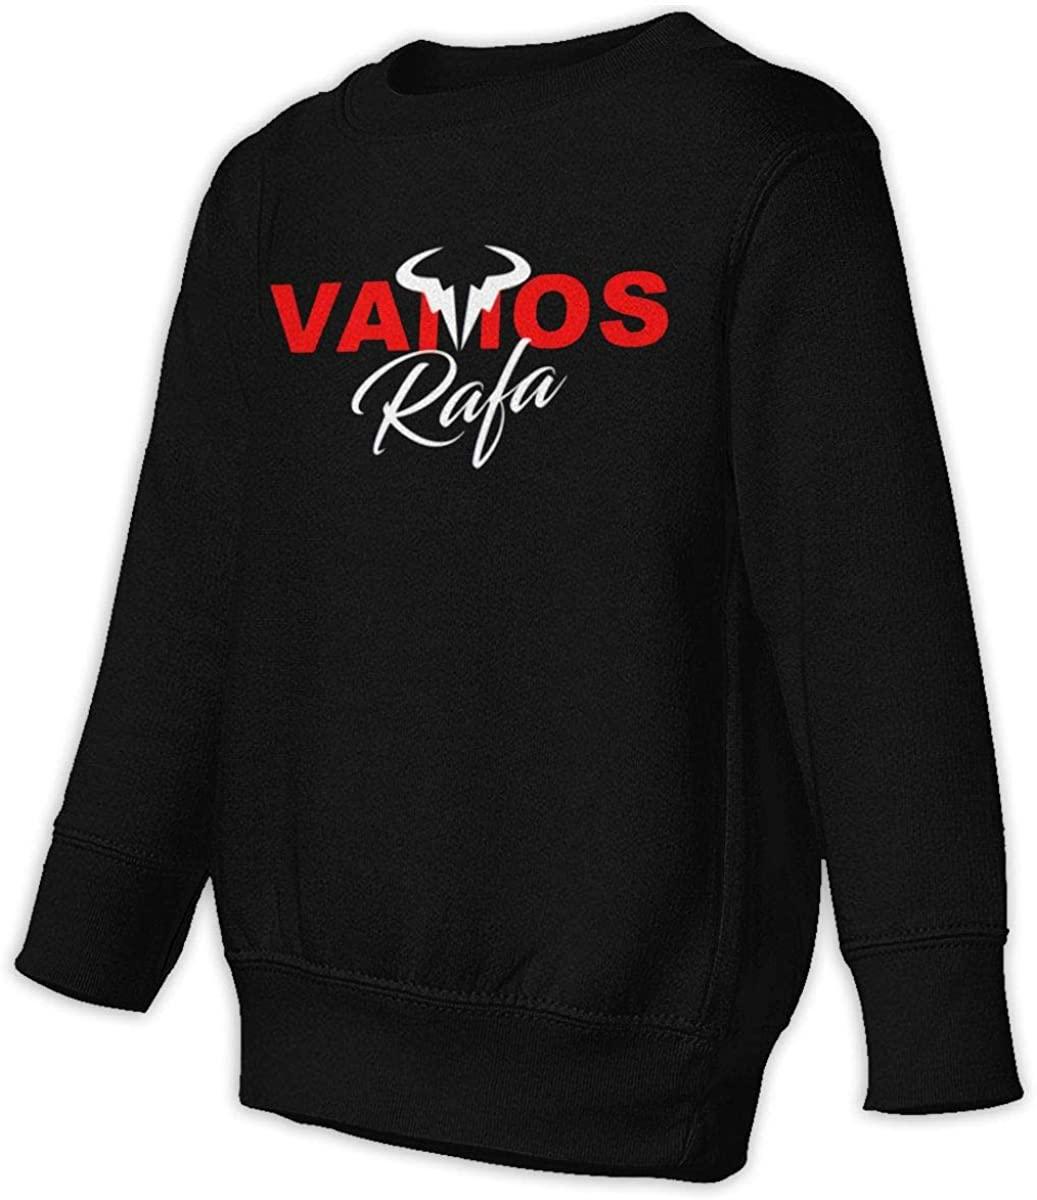 LSHLKJDFN Vamos Rafa Rafael Nadal Tennis Star Favorite Player Unisex Sweatshirt Youth Boy and Girls Pullover Sweatshirt Black